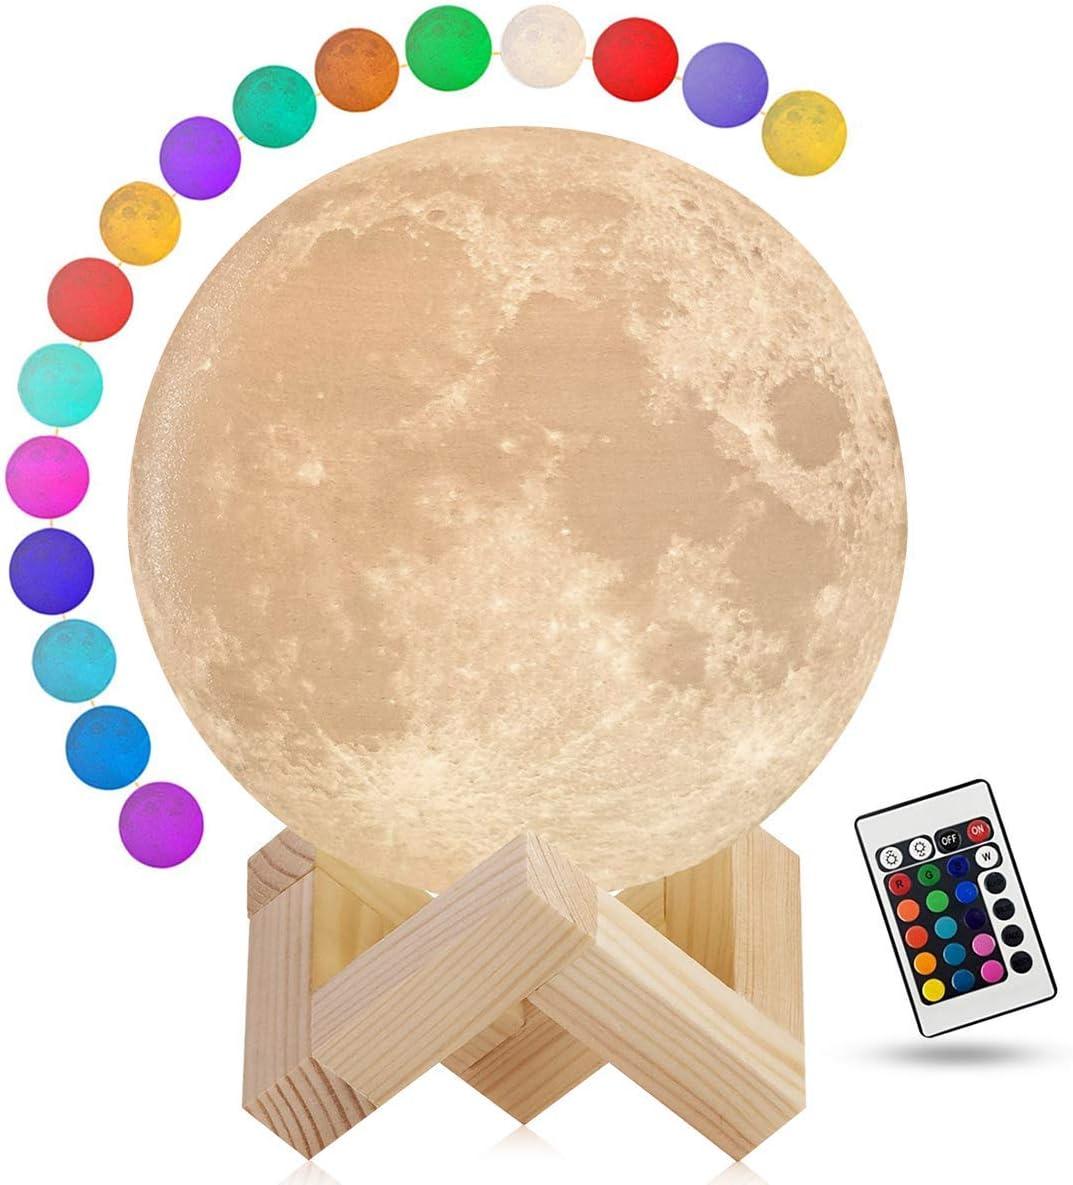 Gahaya Seamless Moon Lamp